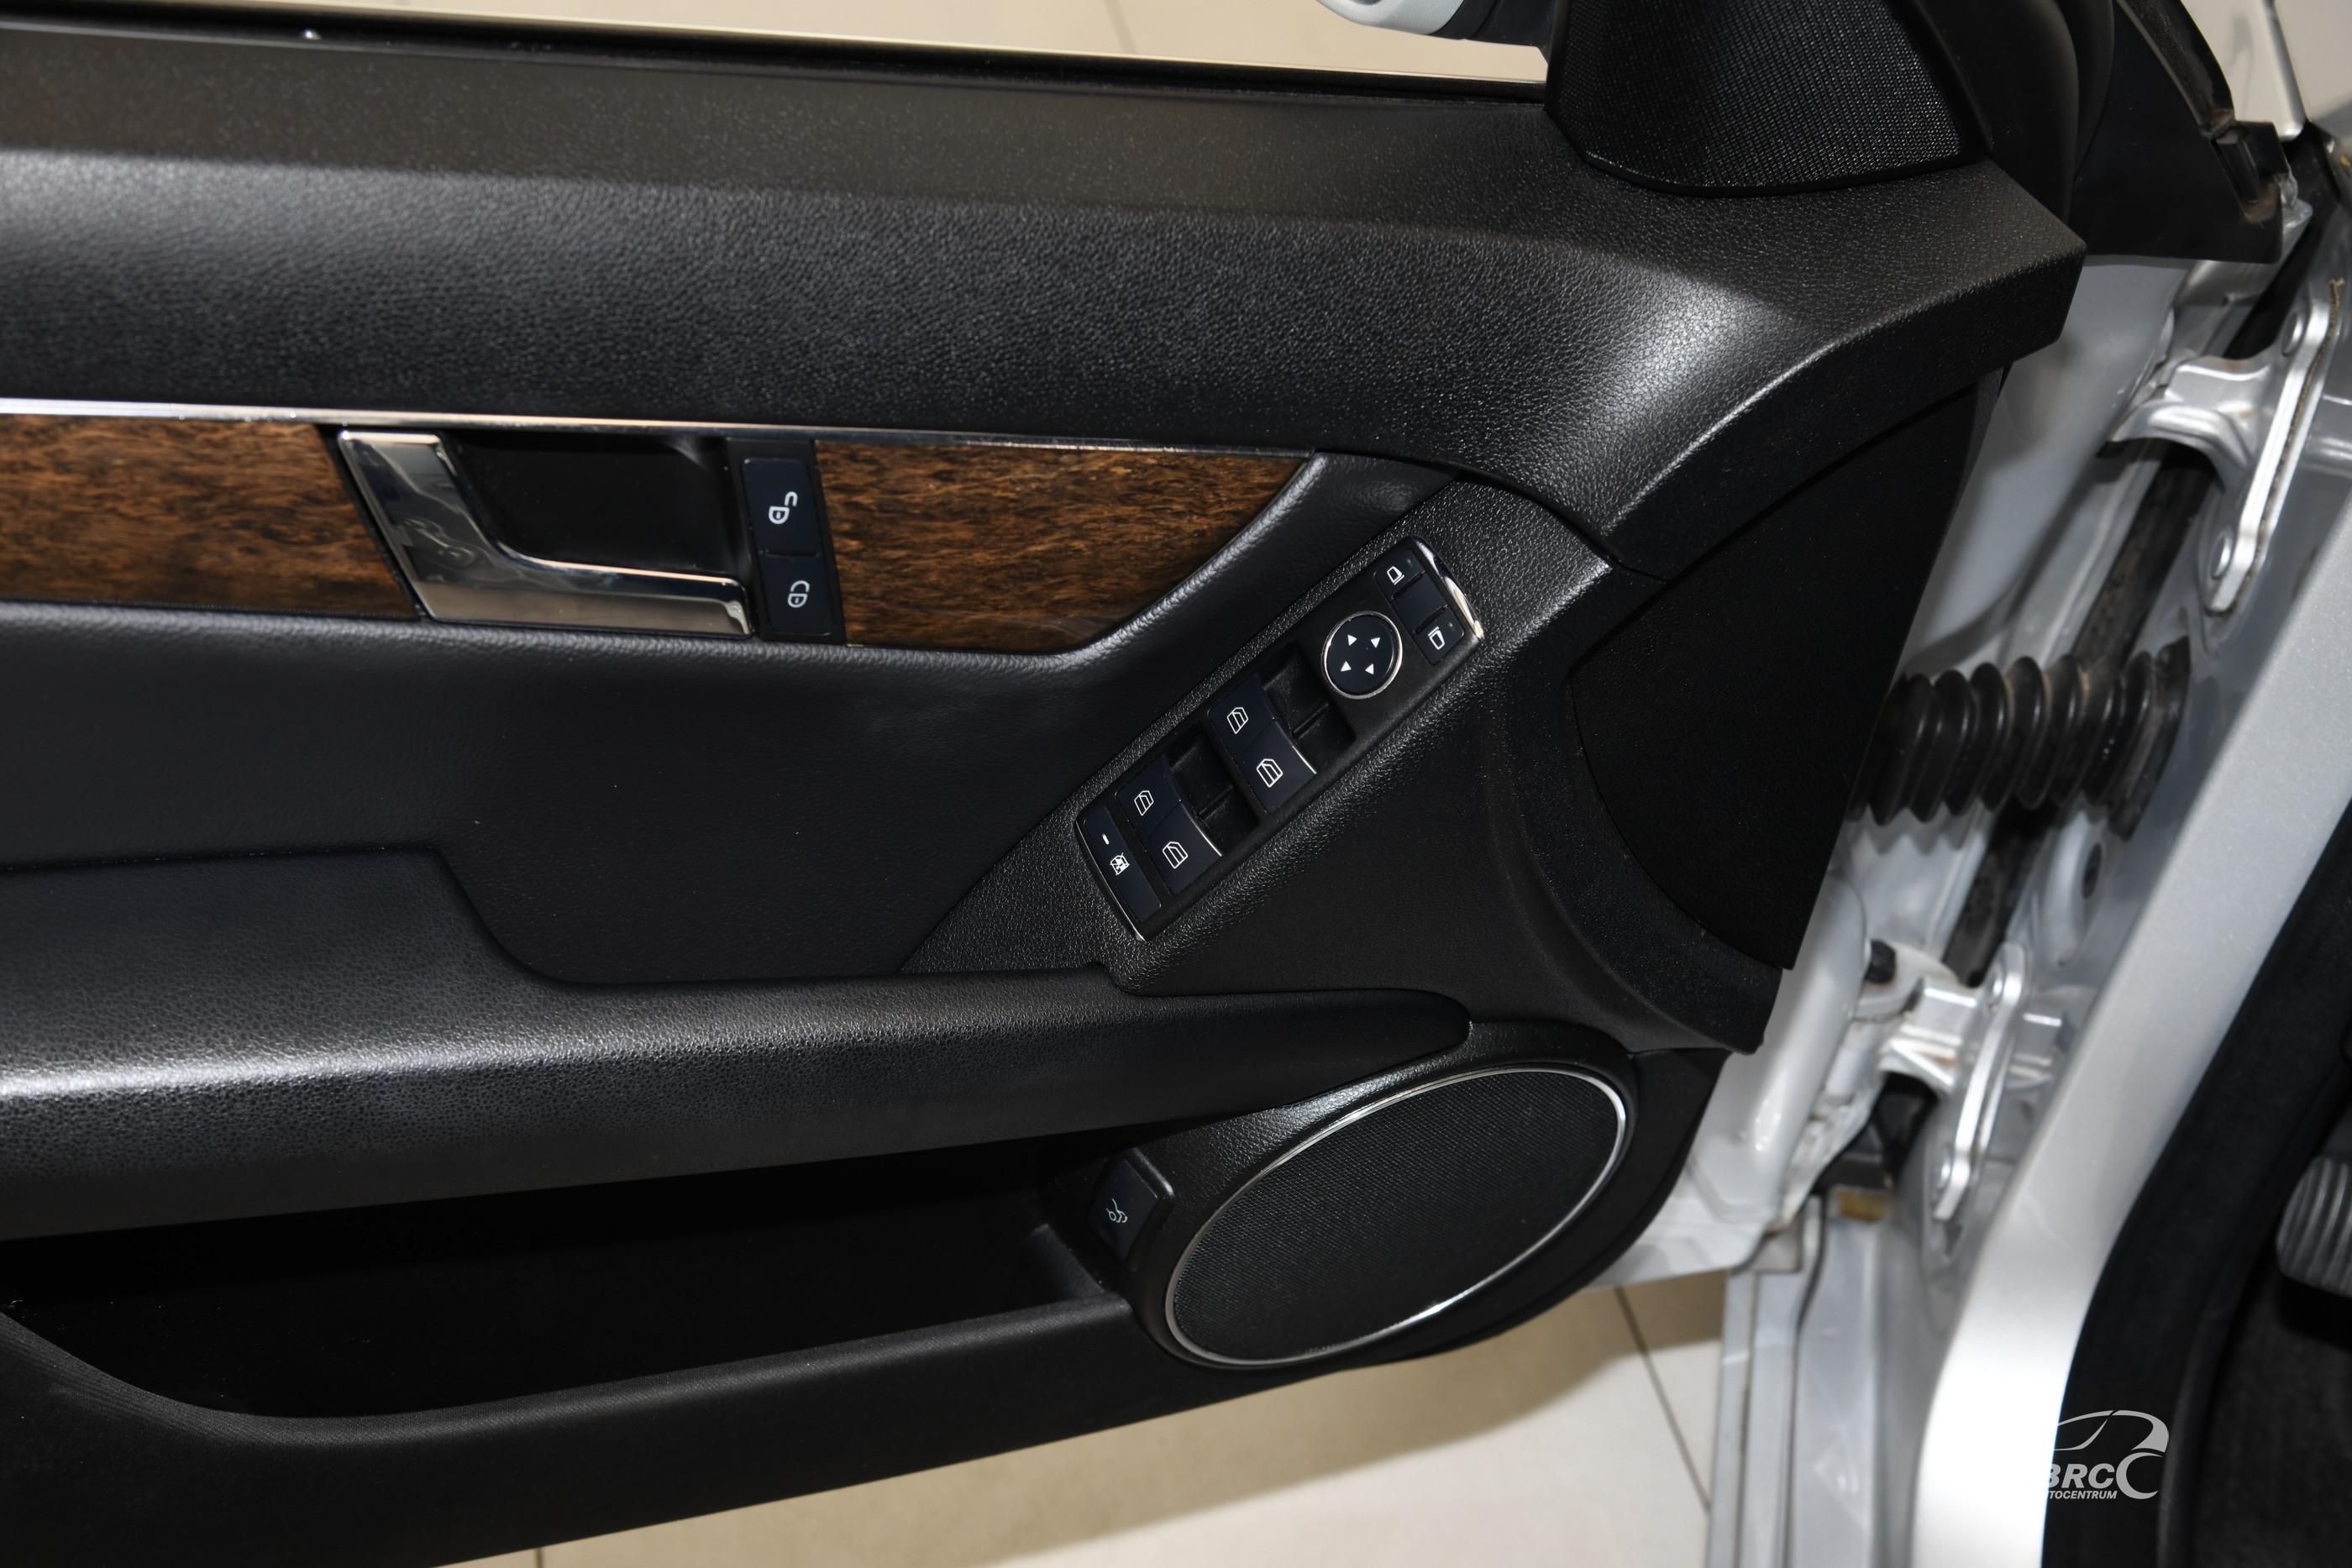 Mercedes-Benz C 180 Kompressor BlueEFFICIENCY Automatas